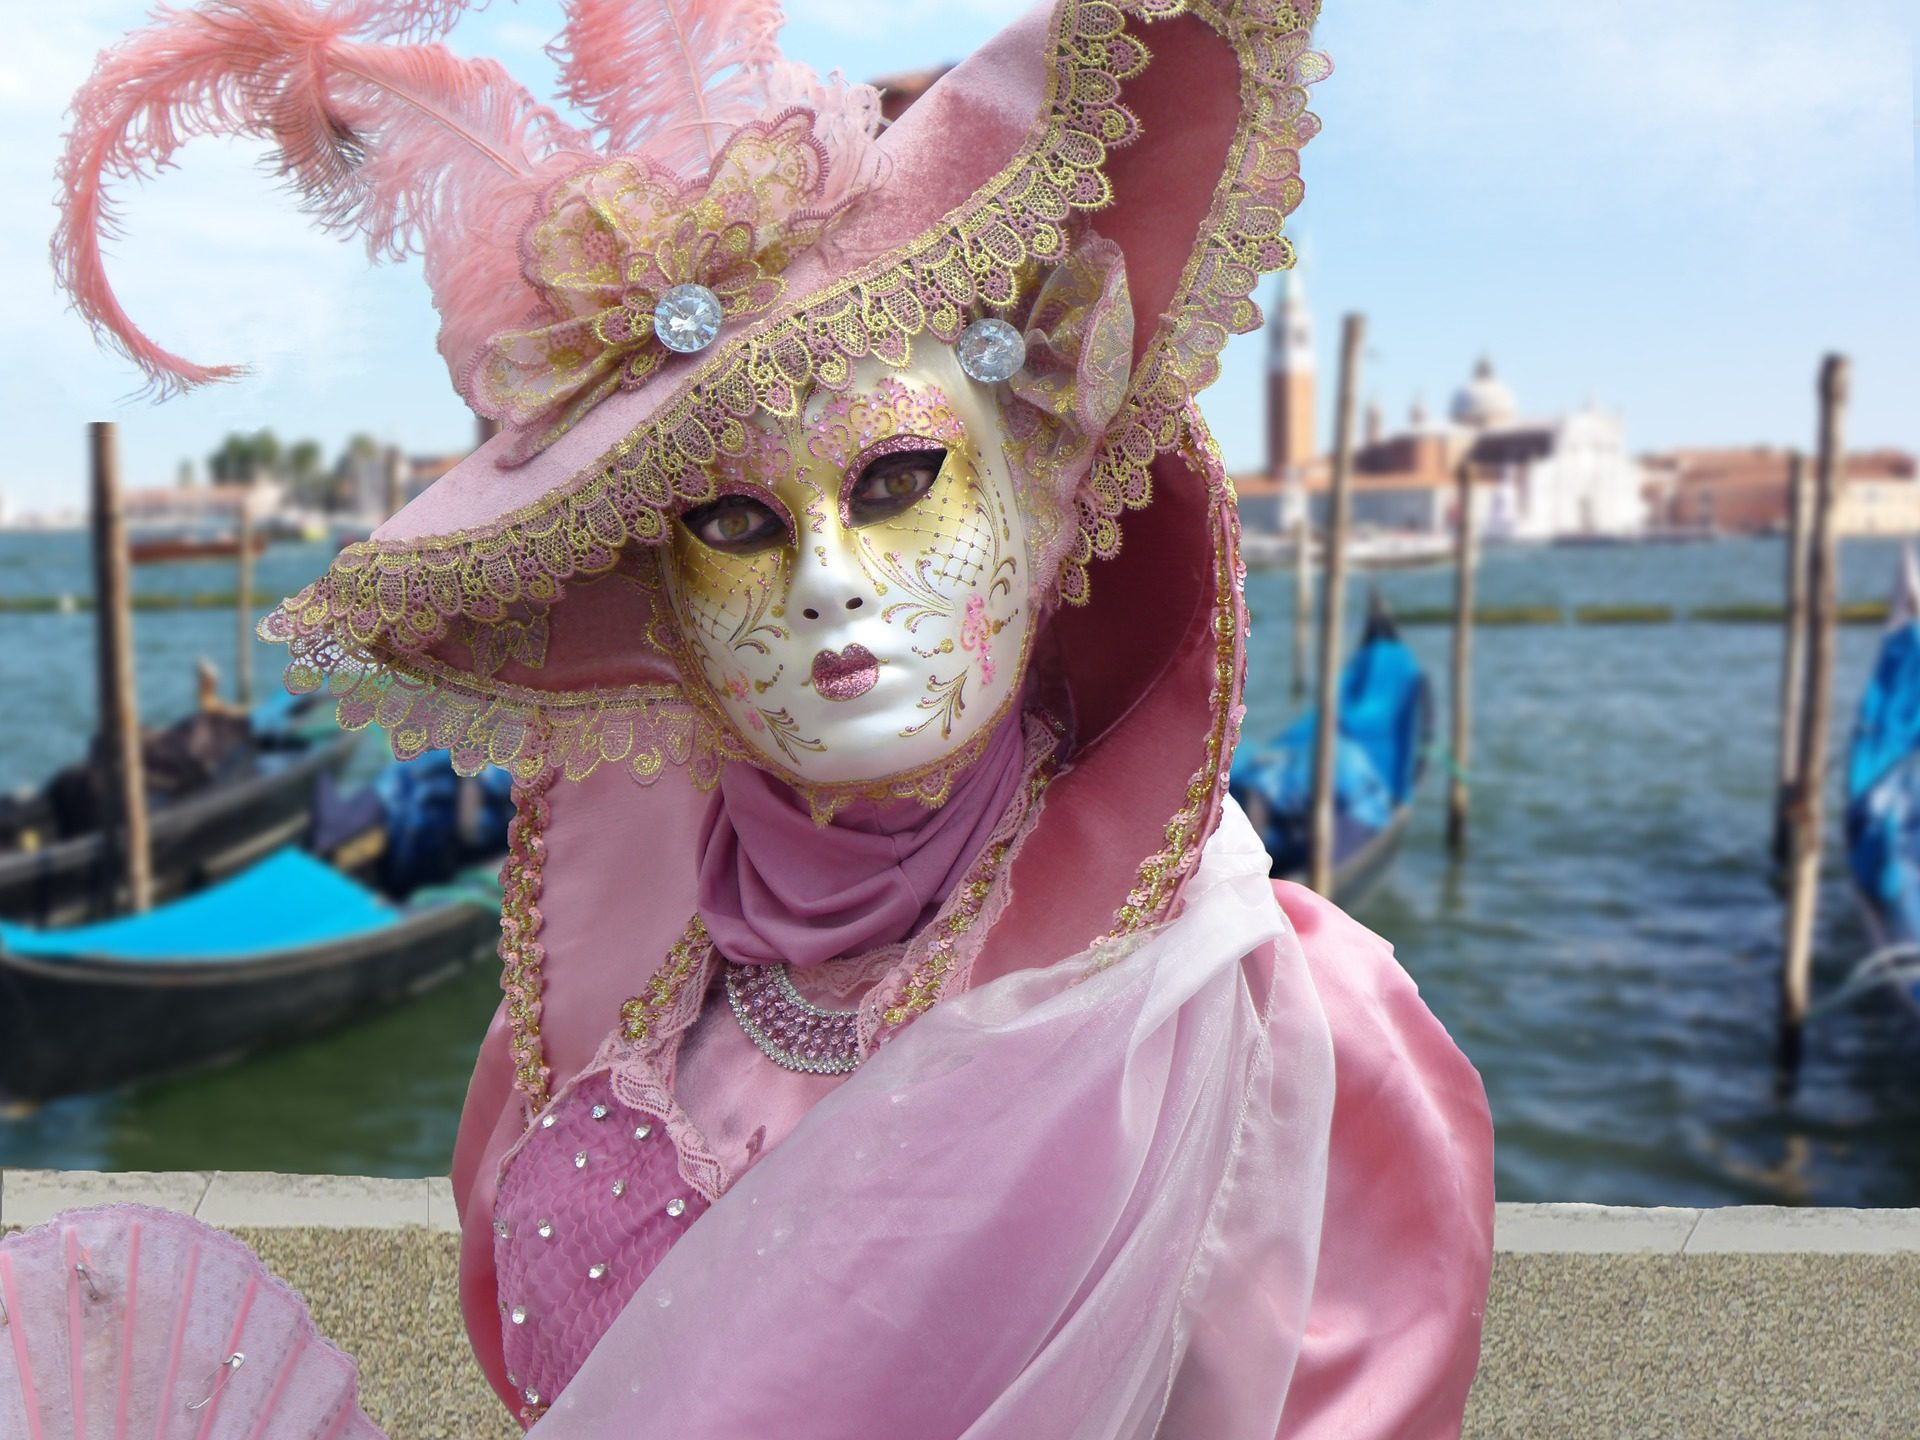 máscara, fantasia, carnaval, Veneza, Itália - Papéis de parede HD - Professor-falken.com